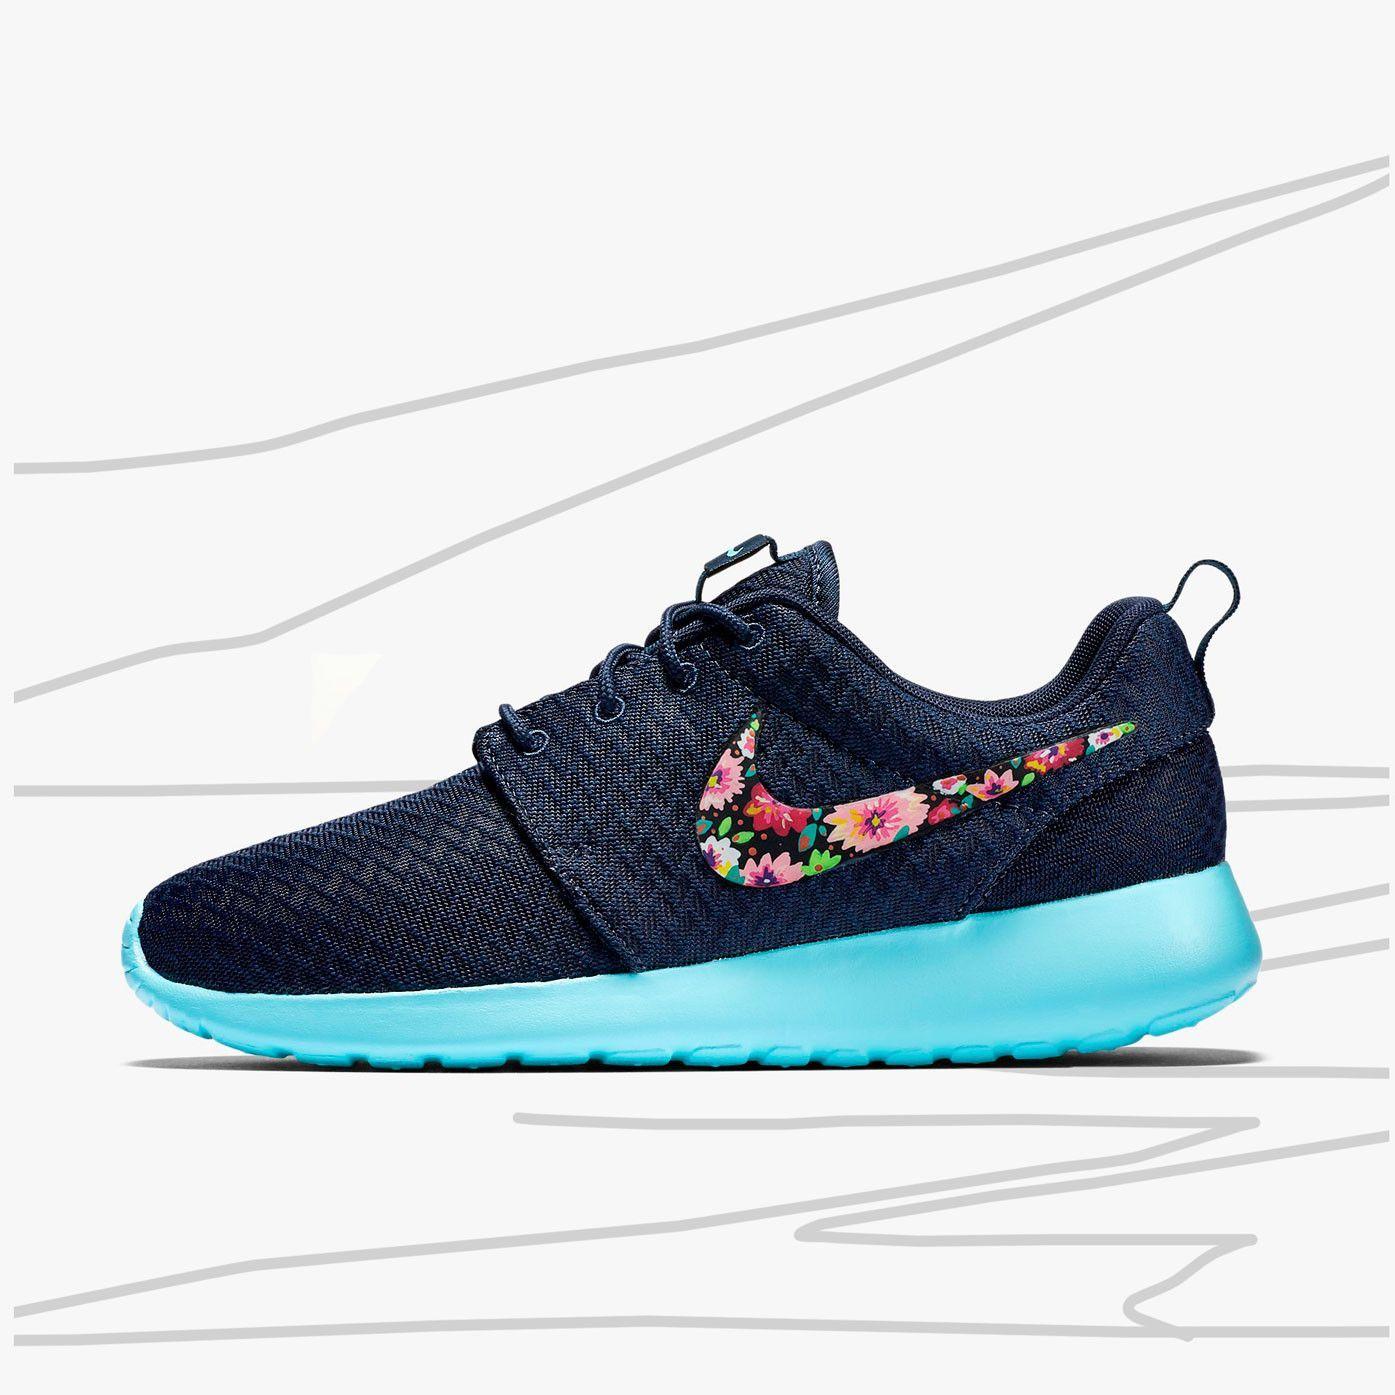 b94f8cf599599 Custom Nike Roshe run Floral design